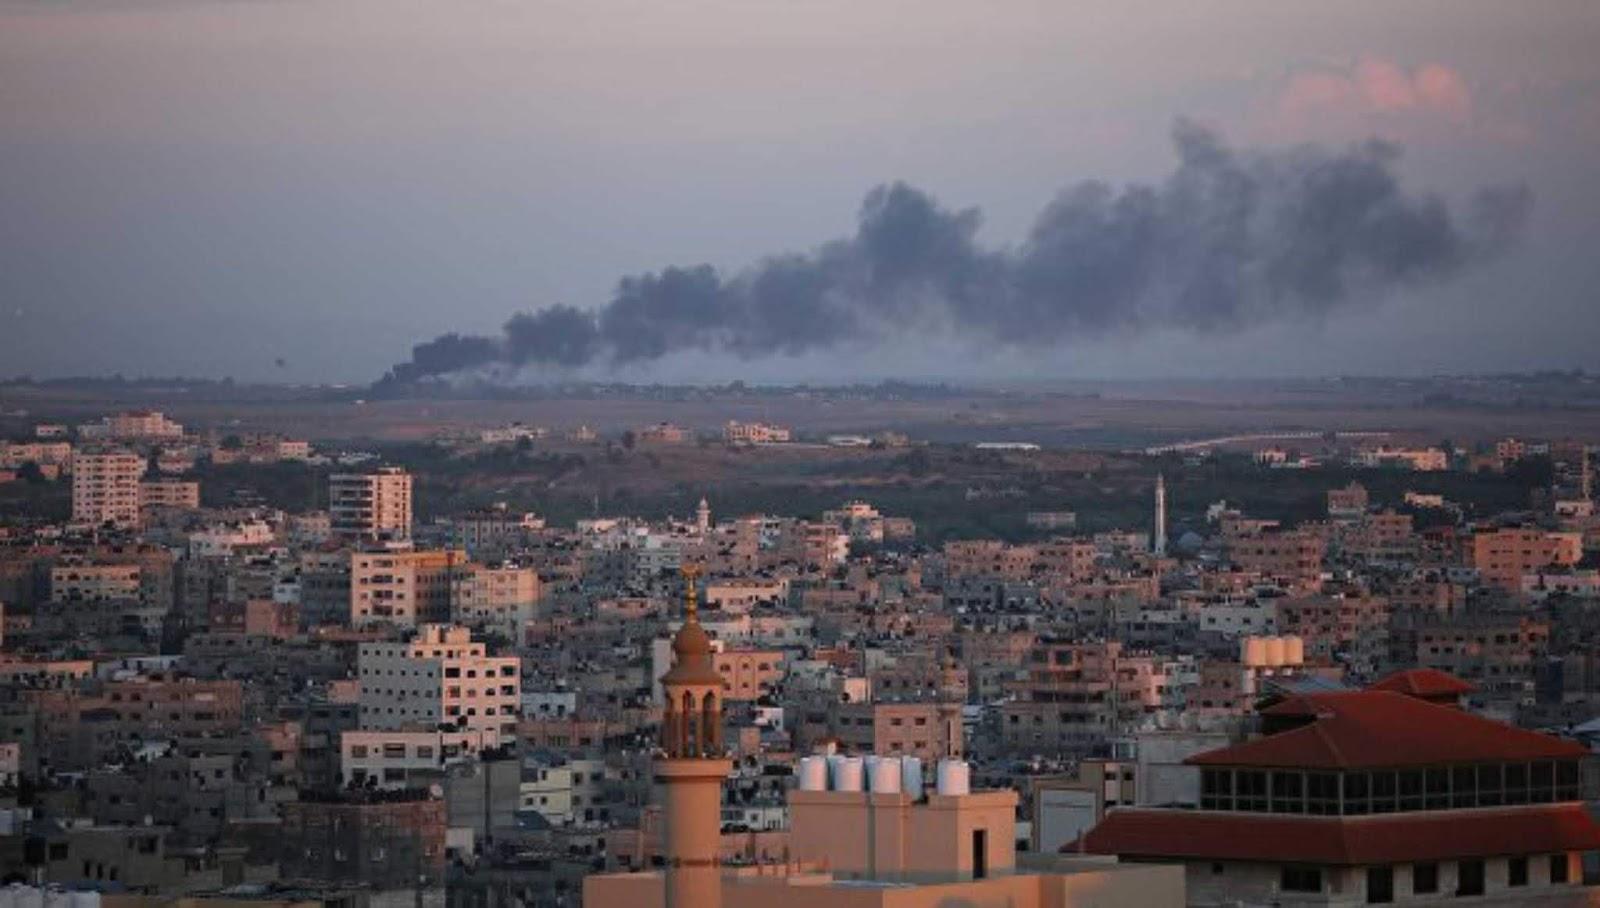 Kemlu Rusia mengirim undangan kepada pimpinan Hamas untuk mengunjungi Moskow